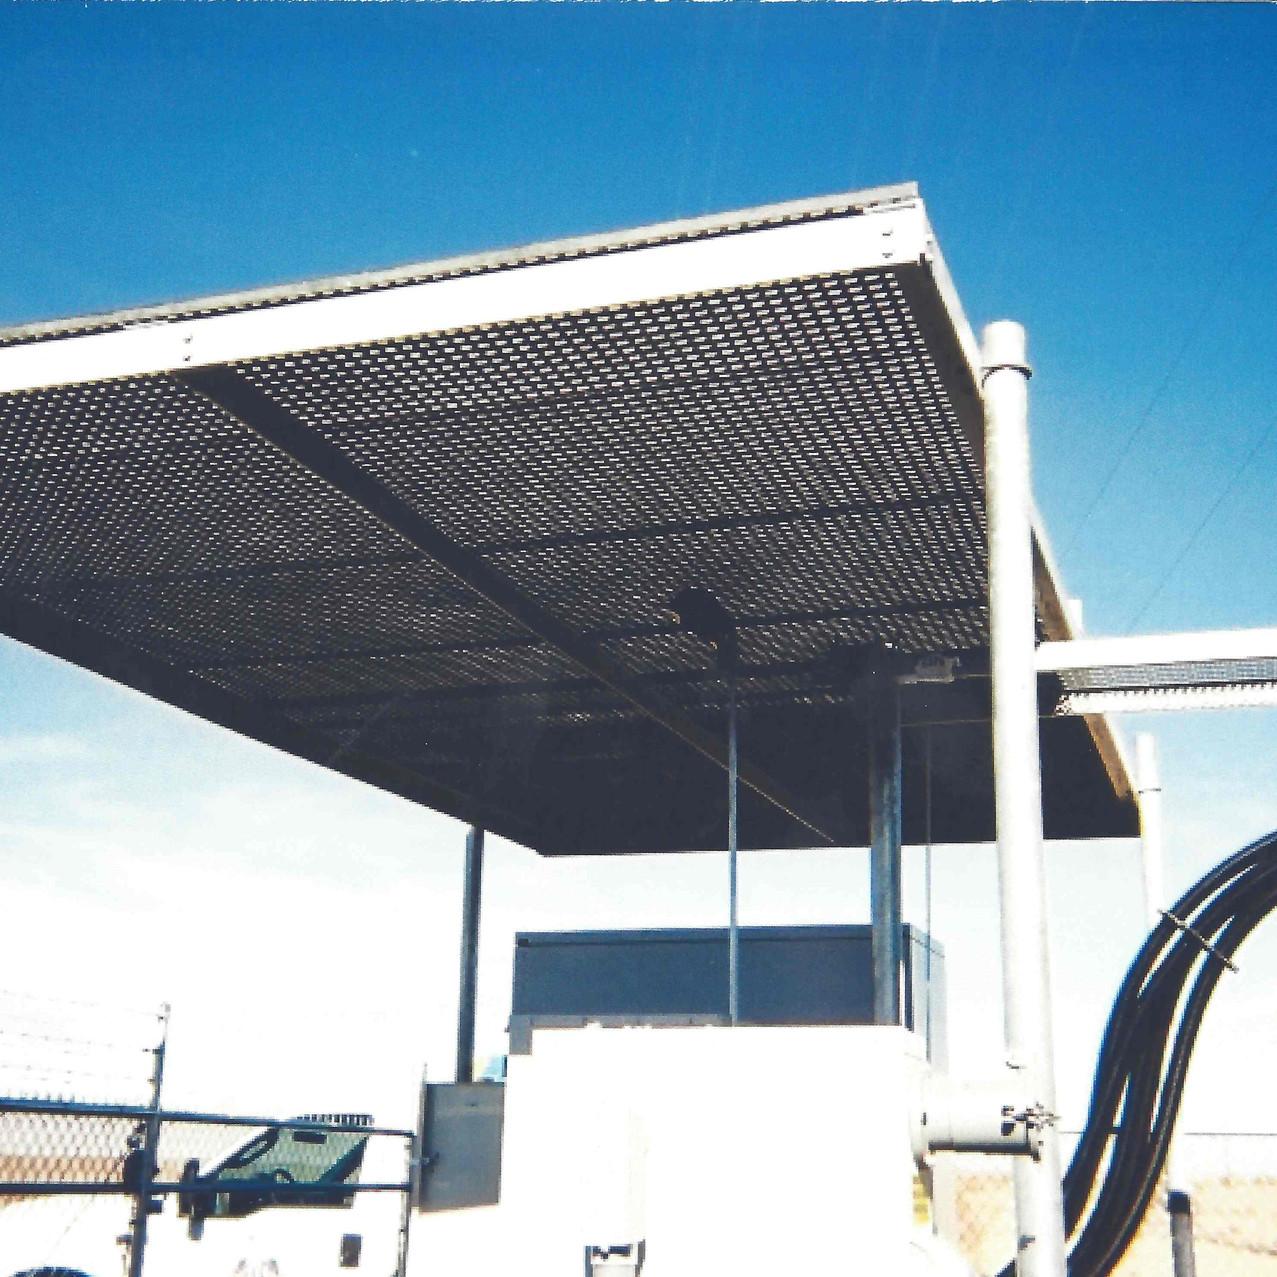 Steel Grating Roof